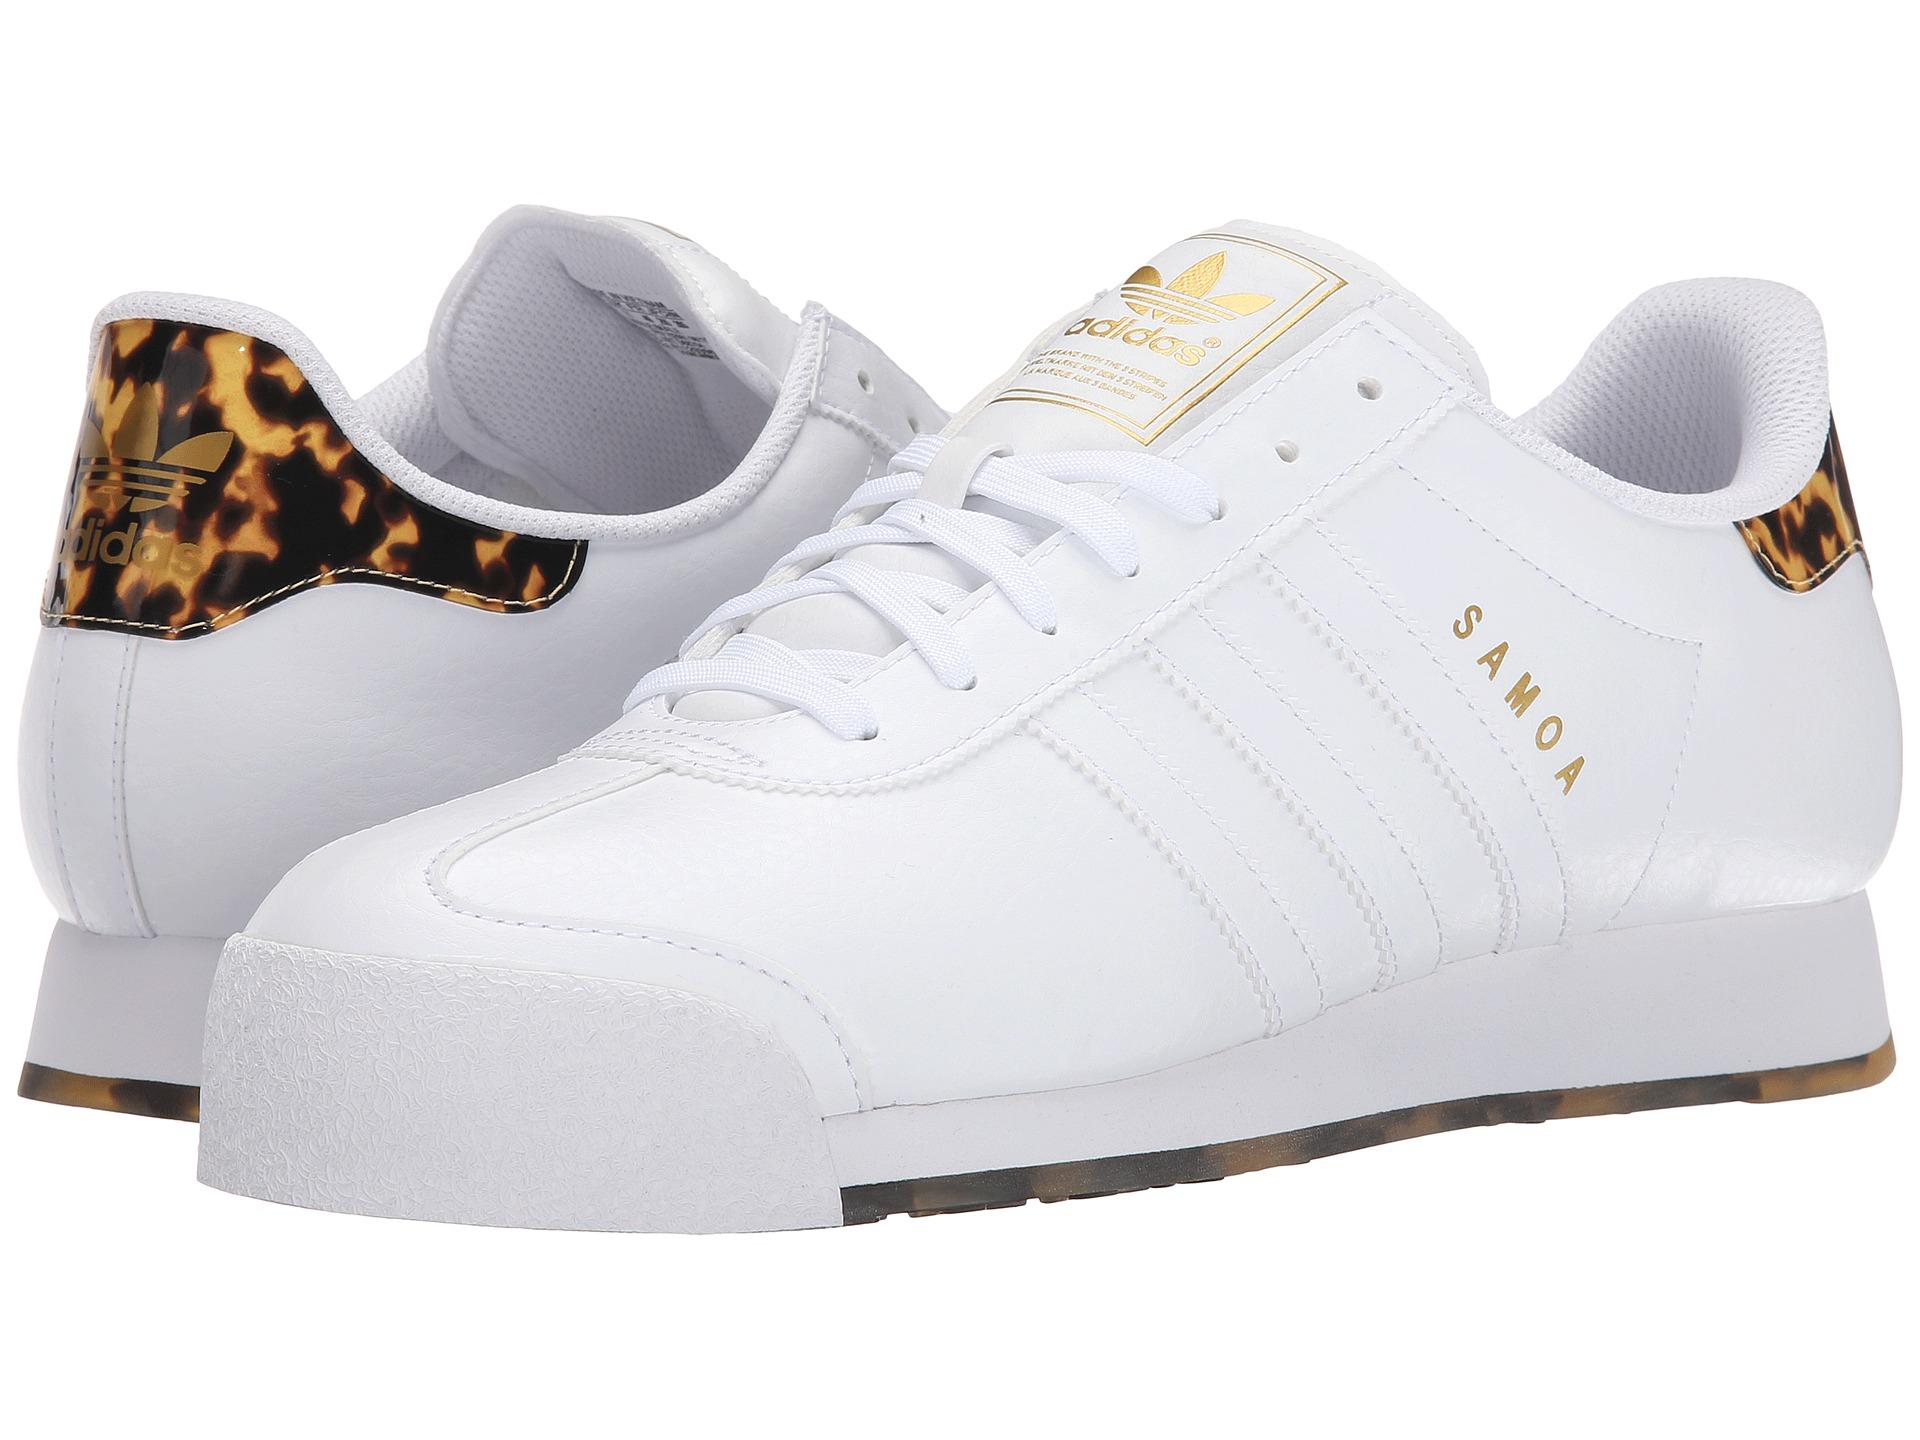 Lyst - adidas Originals Samoa - Tortoise Shell in White 4016ea3a4